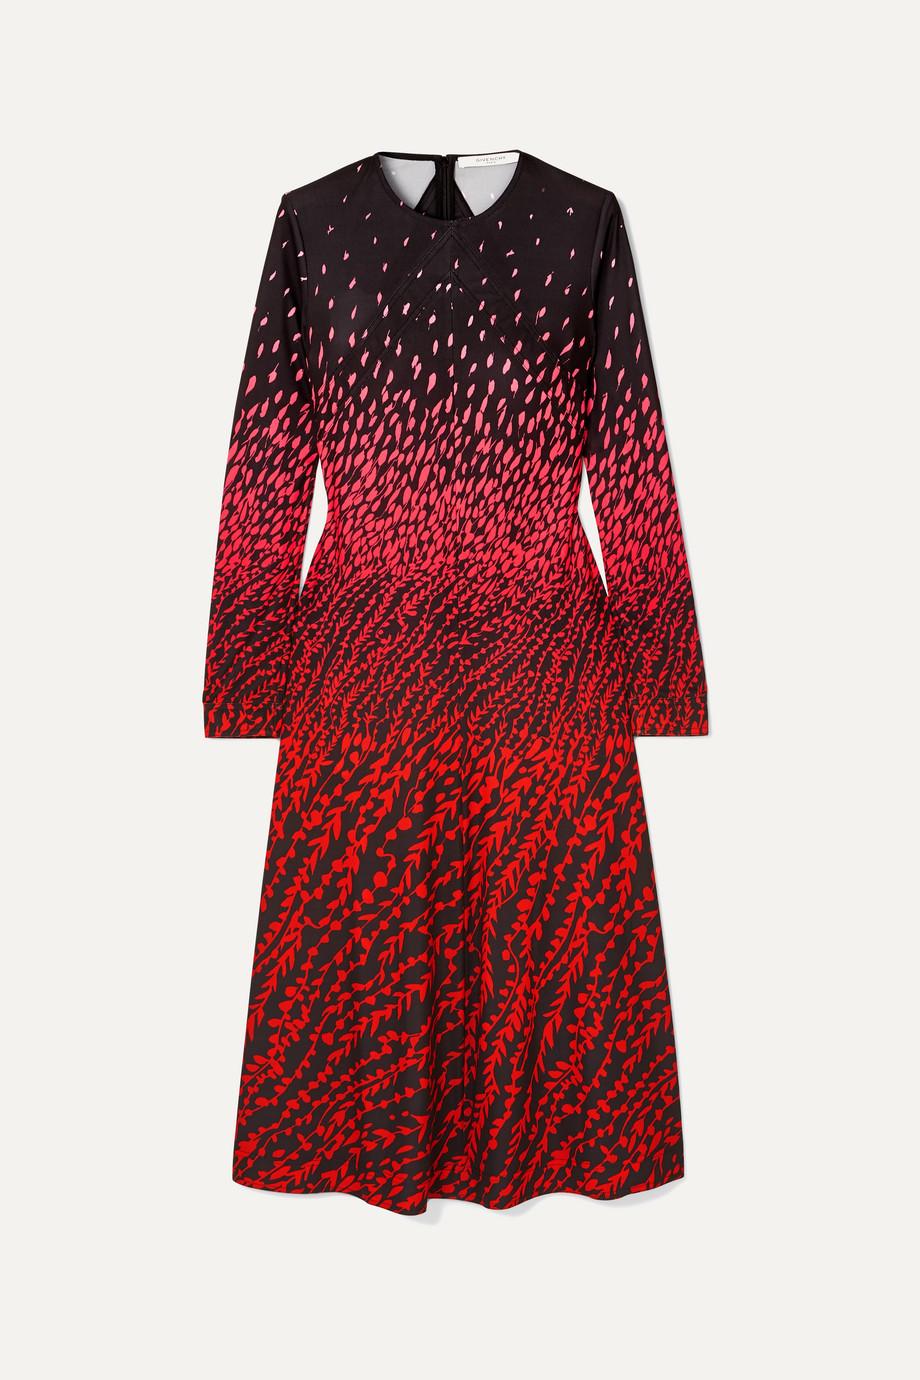 Givenchy   Printed crepe midi dress   NET-A-PORTER.COM